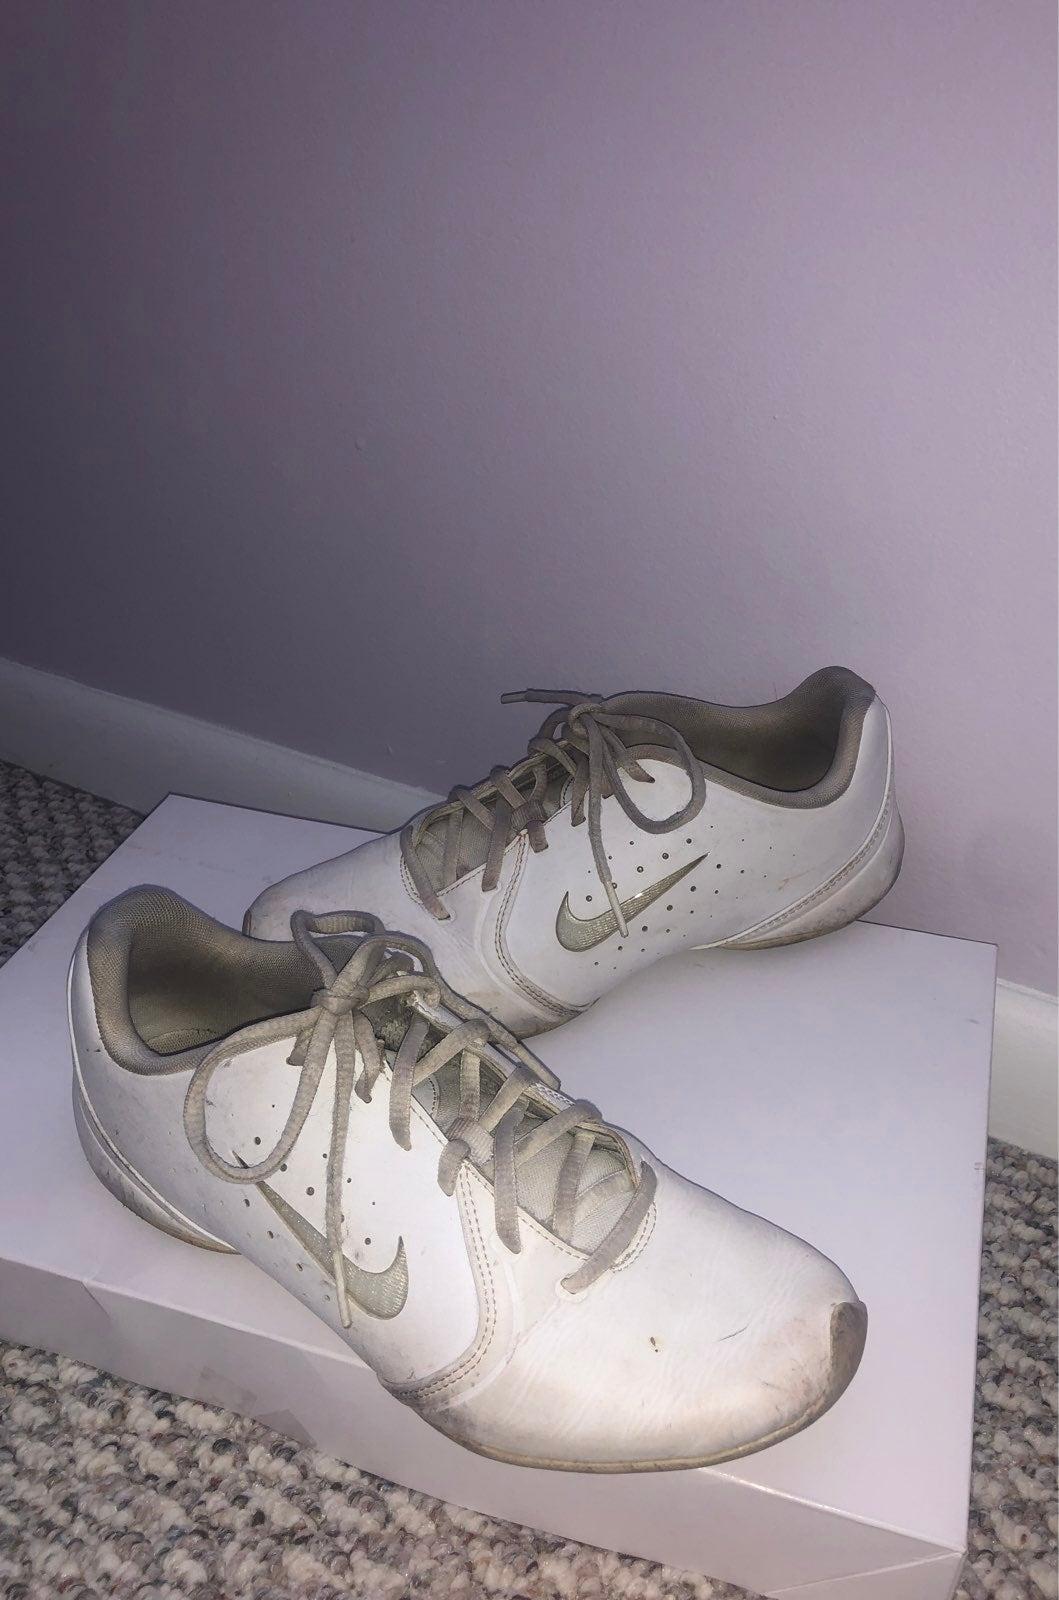 Nike Pro White Tennis Shoes